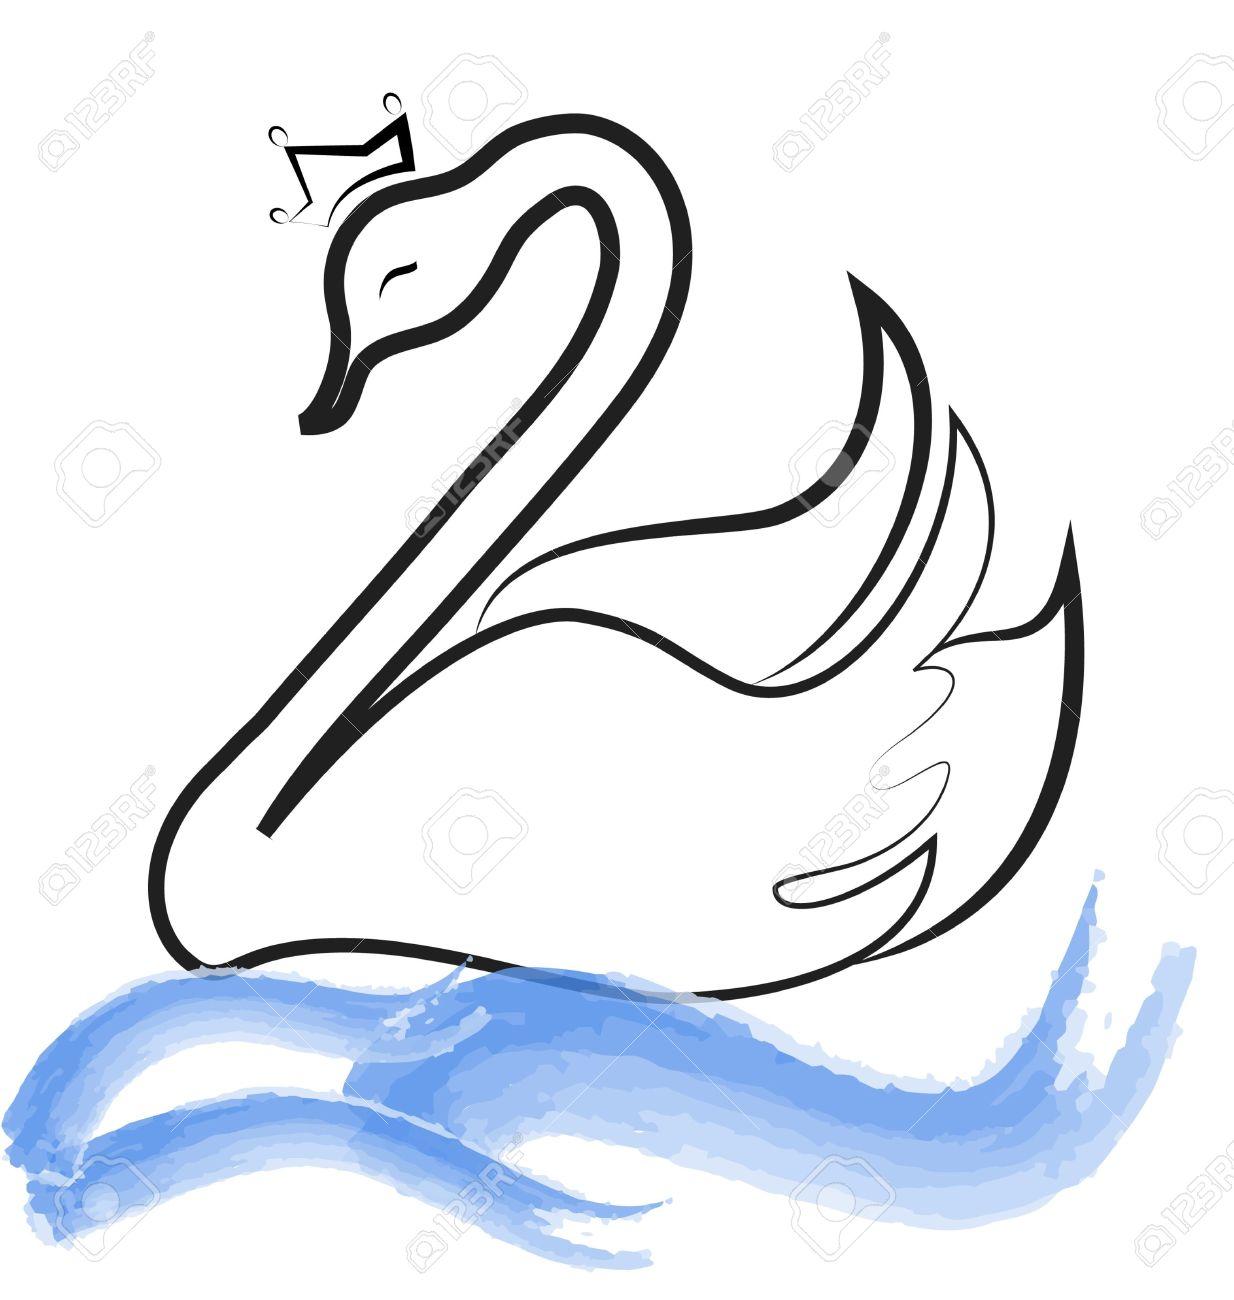 Clipart swan lake.